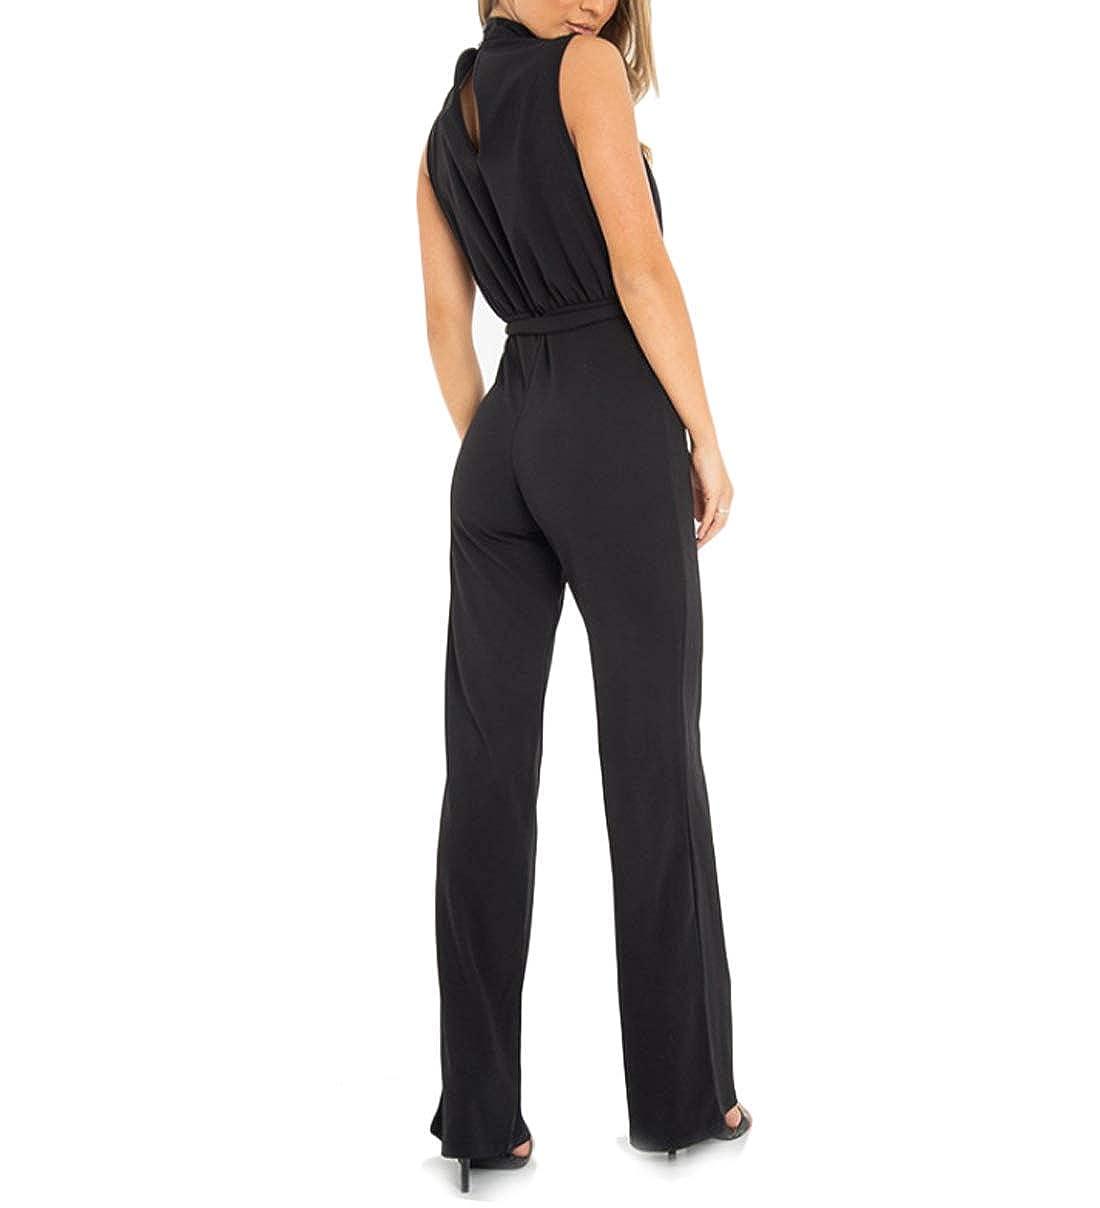 BGDream Women Fashion Elegant Solid Sleeveless Tie Waist Bodycon Jumpsuit Wide Leg Jumpsuit Pants